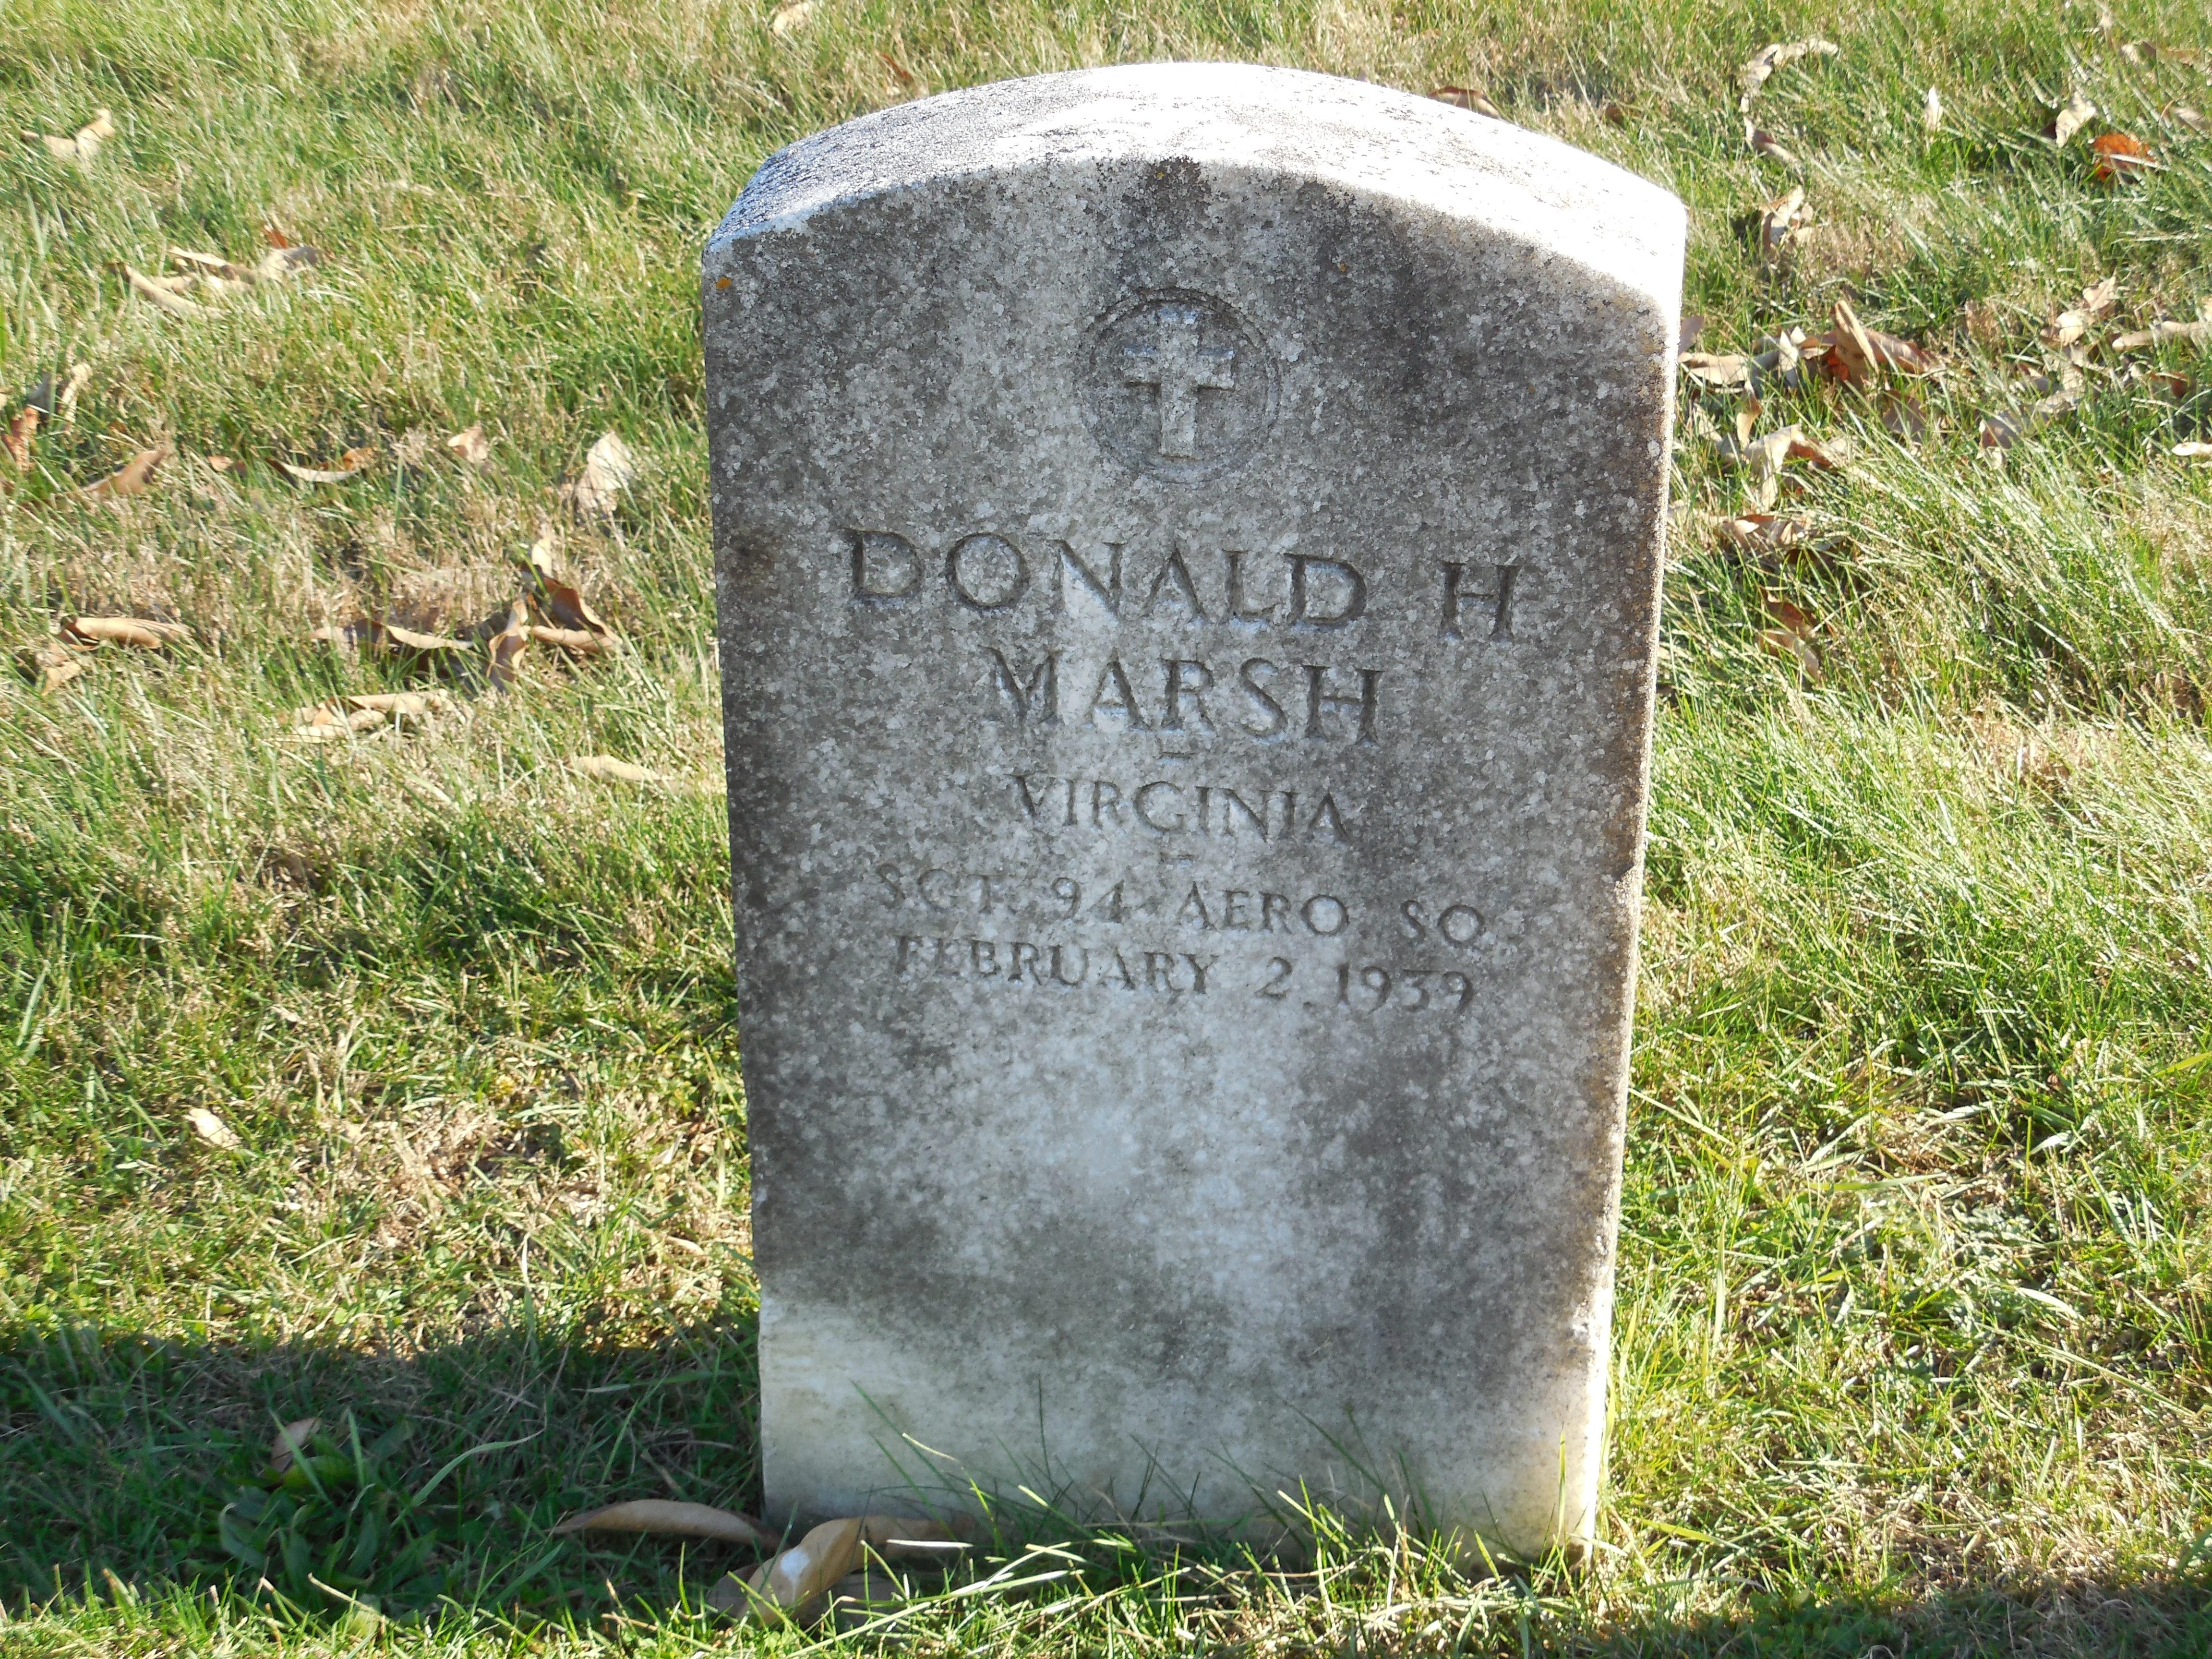 Donald H. Marsh